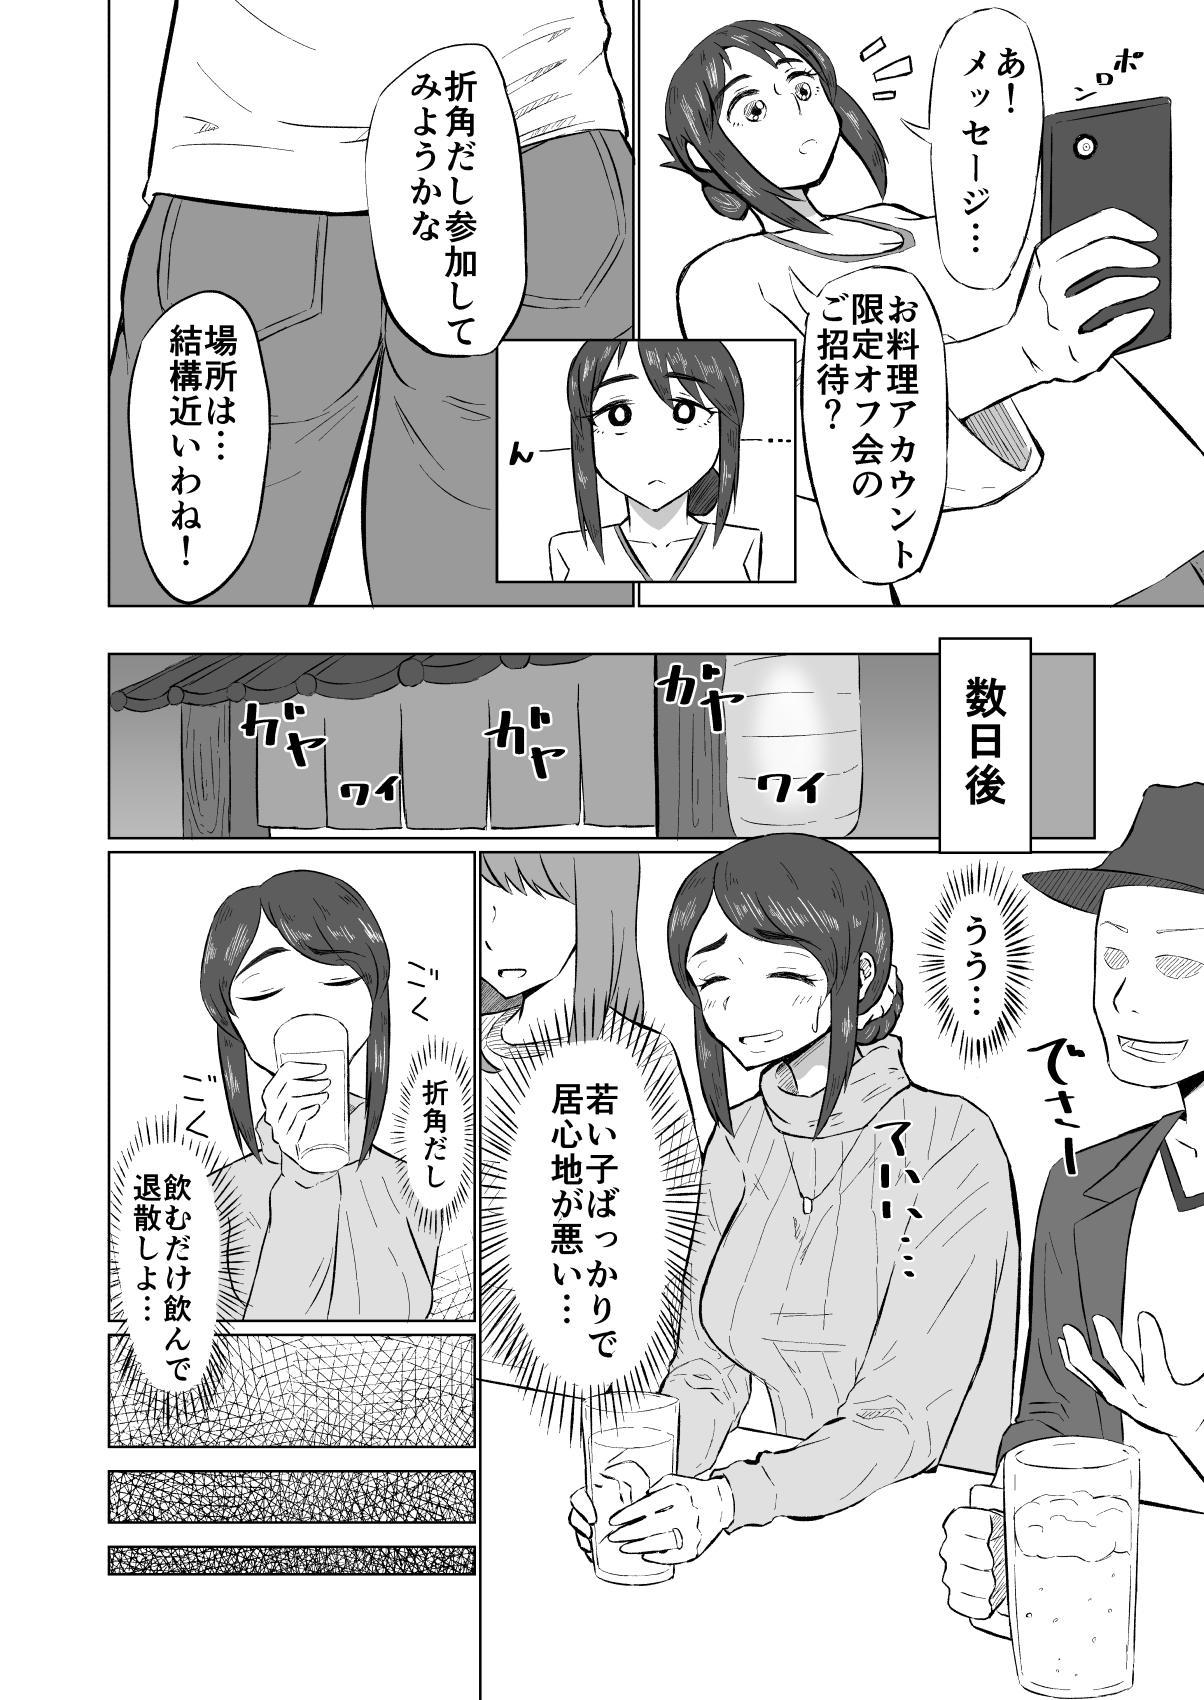 Hitozuma ga Off-kai de Omochikaerare Hon 3